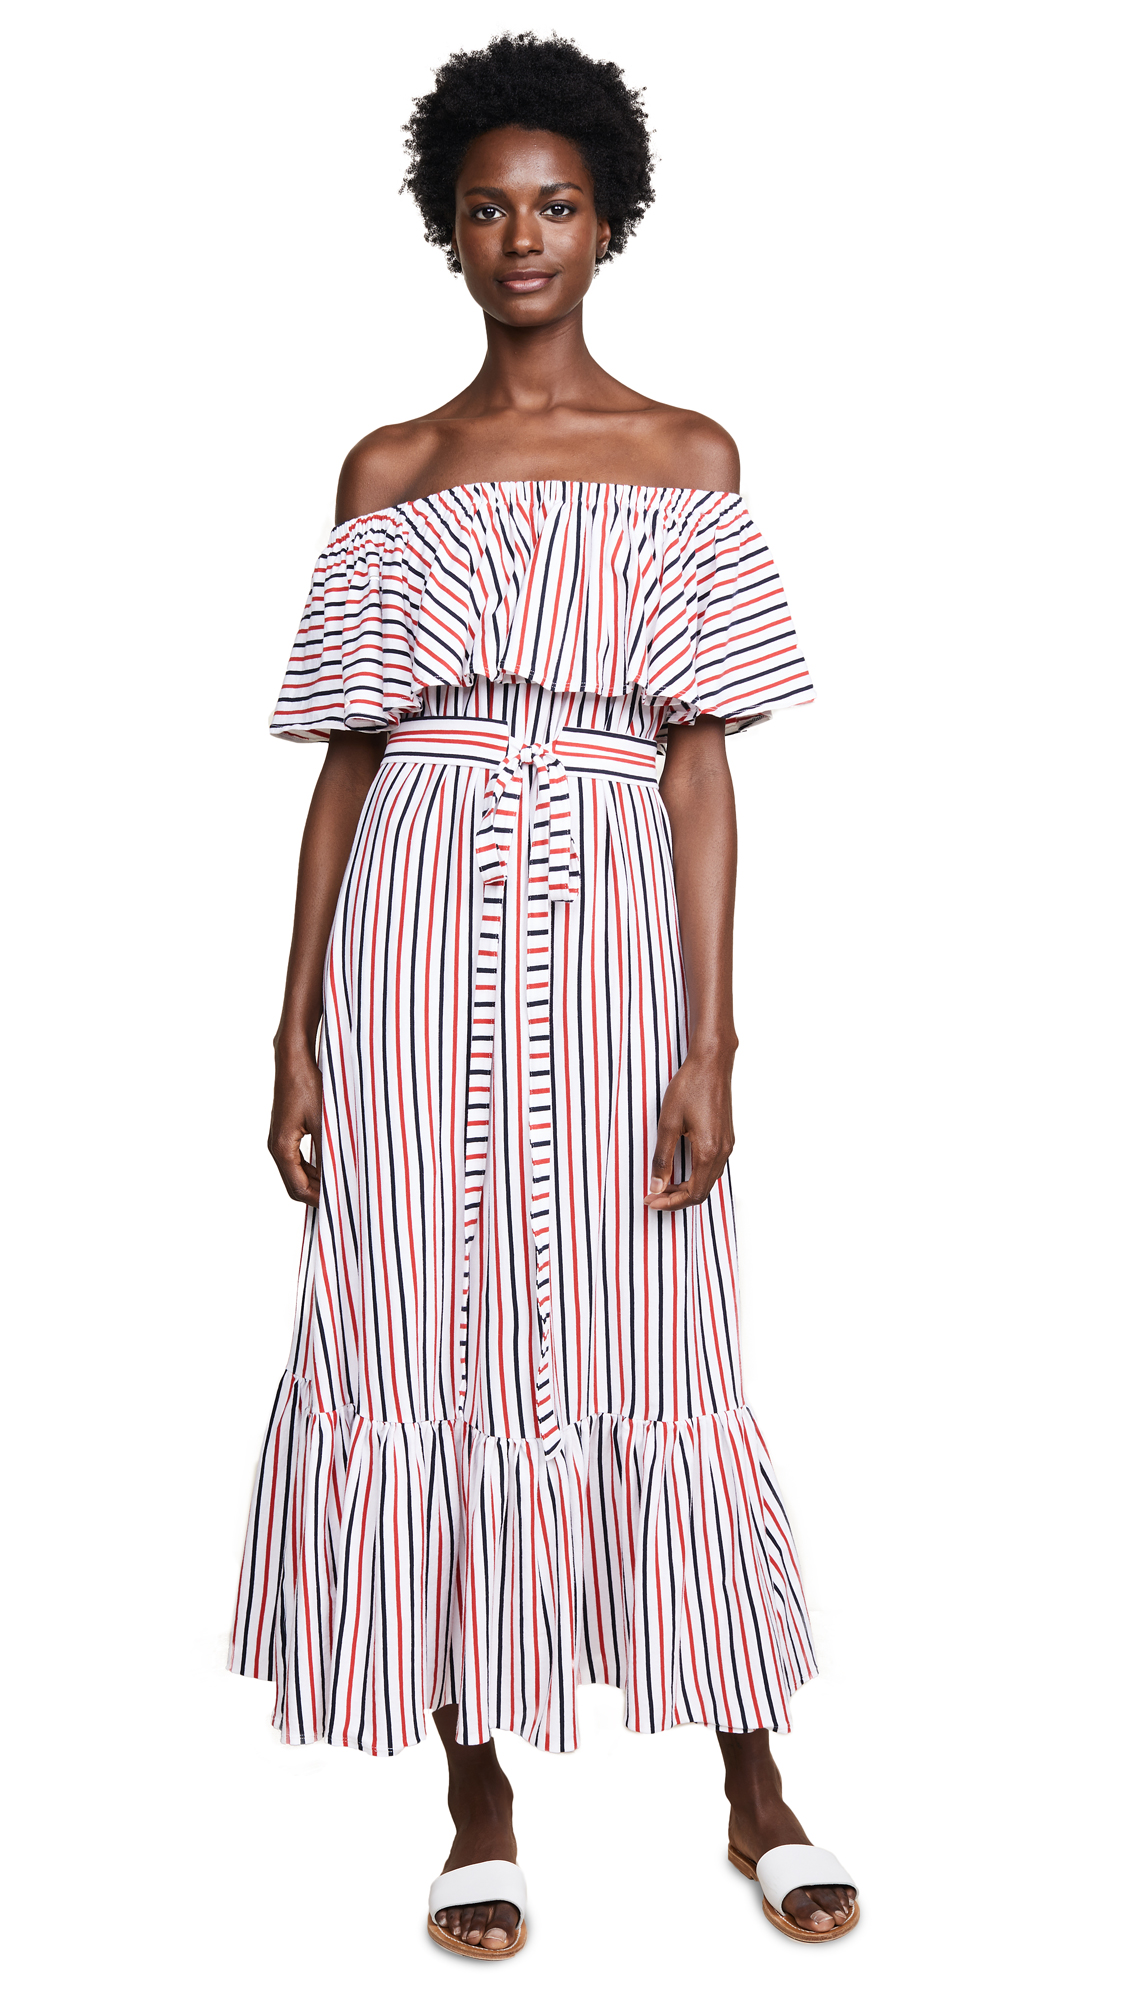 MDS Stripes Rebecca Ruffle Dress - Navy Coral Stripe